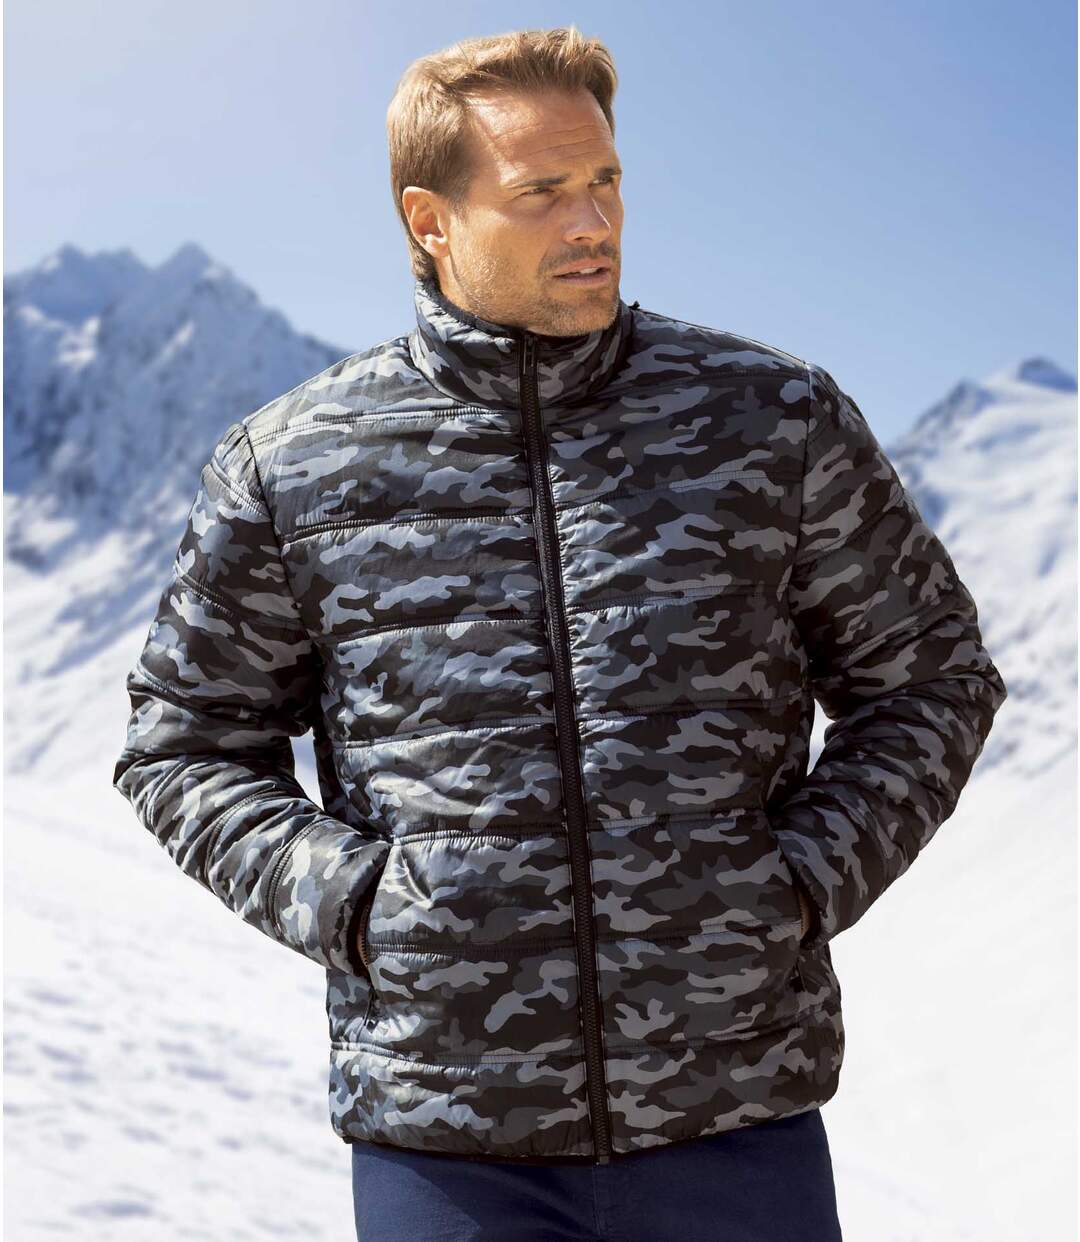 Men's Black & Grey Camouflage Puffer Jacket